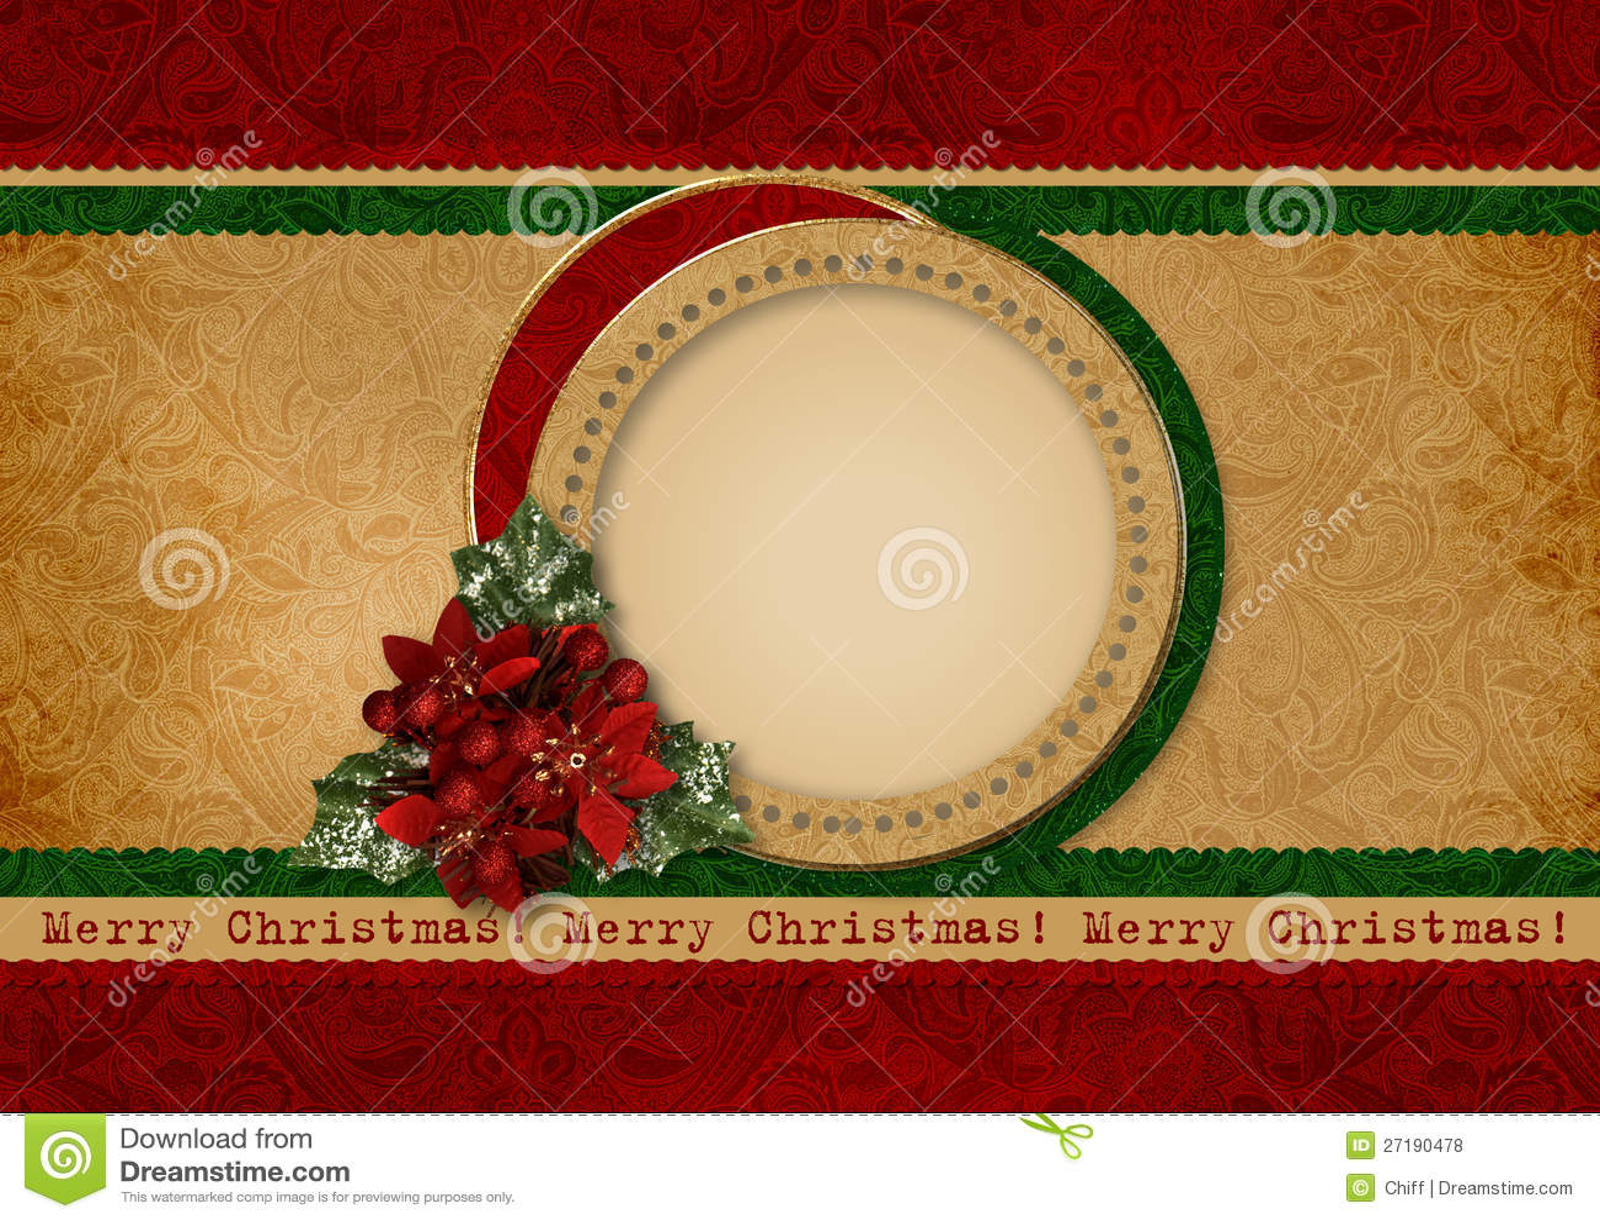 Vintage Christmas Card Royalty Free Stock Photos - Image ...